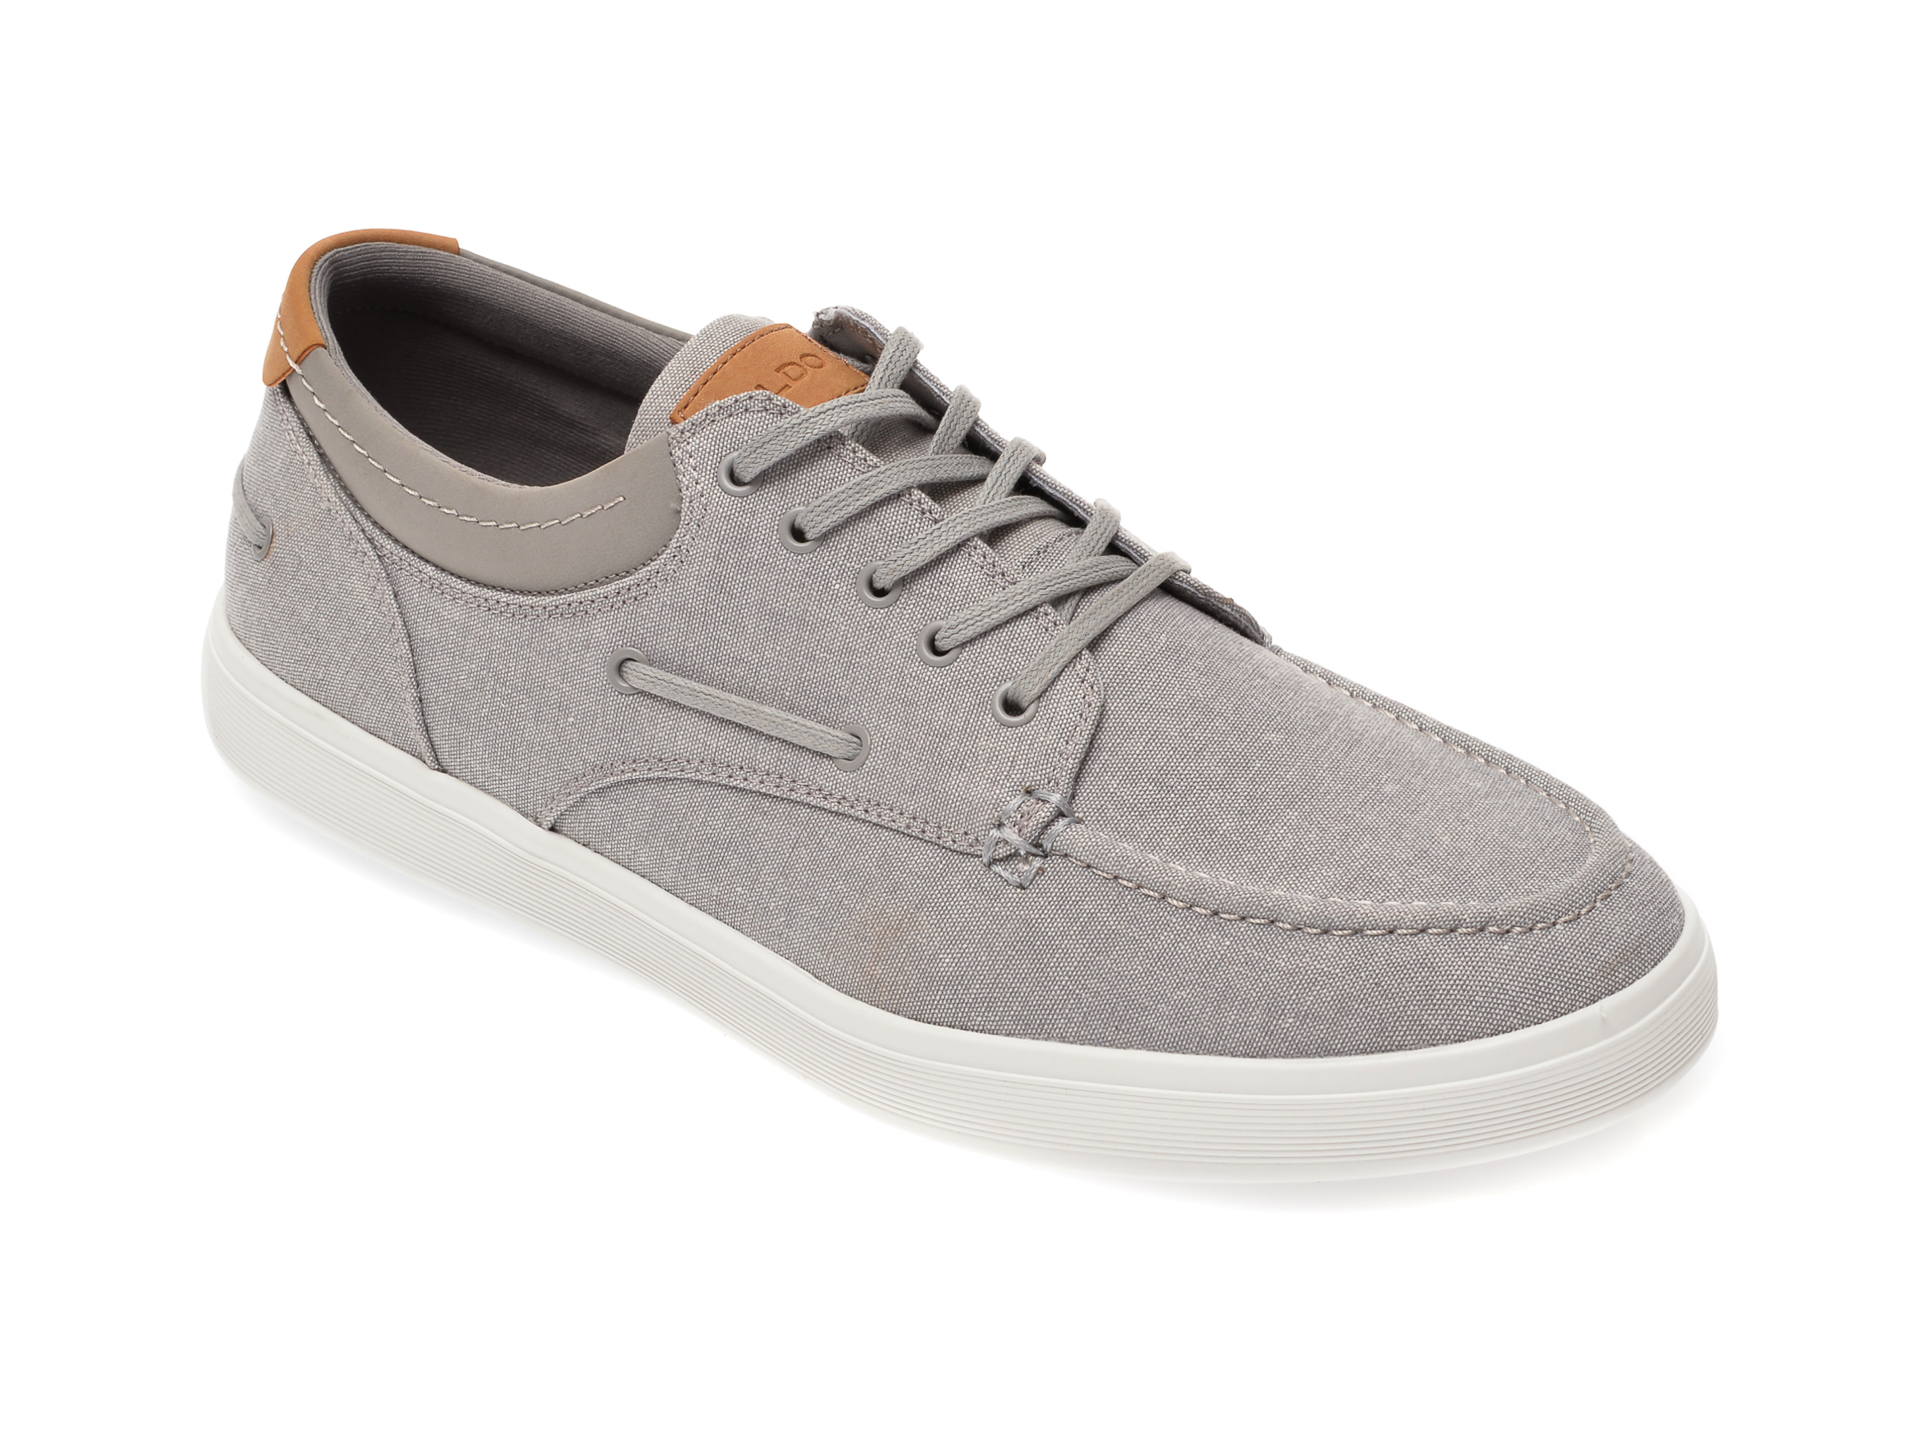 Pantofi ALDO gri, Bridleholme020, din material textil imagine